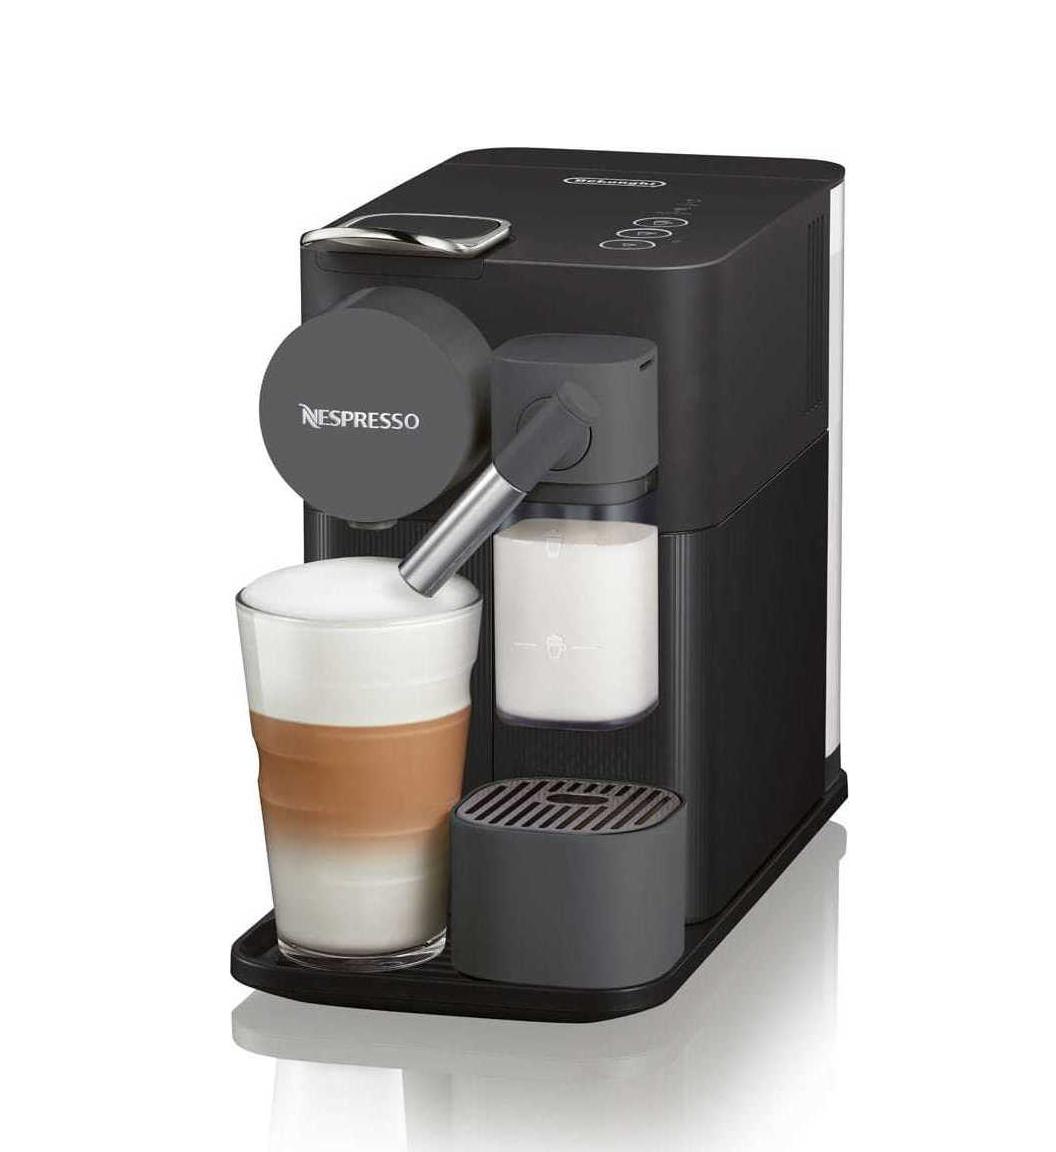 Delonghi Nespresso Lattissima One Μηχανή Espresso EN500B Black  Πληρωμή έως 24 δόσεις